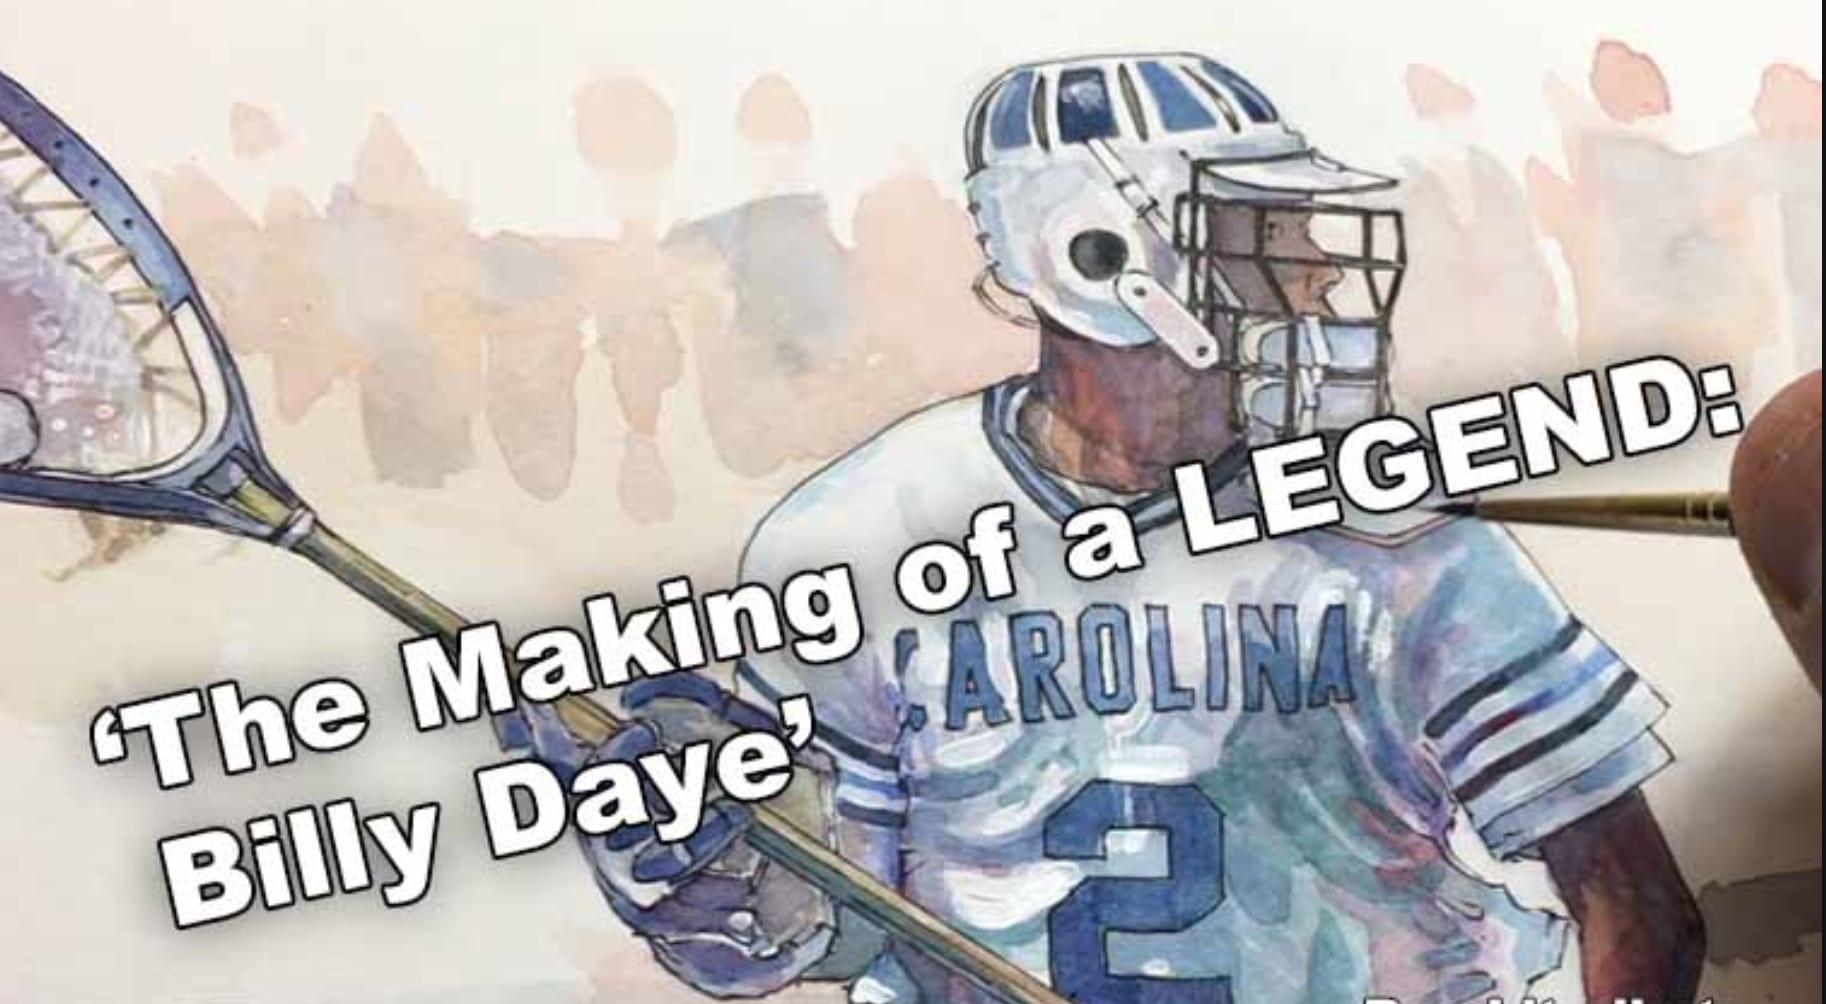 Art of Lax - Billy Daye